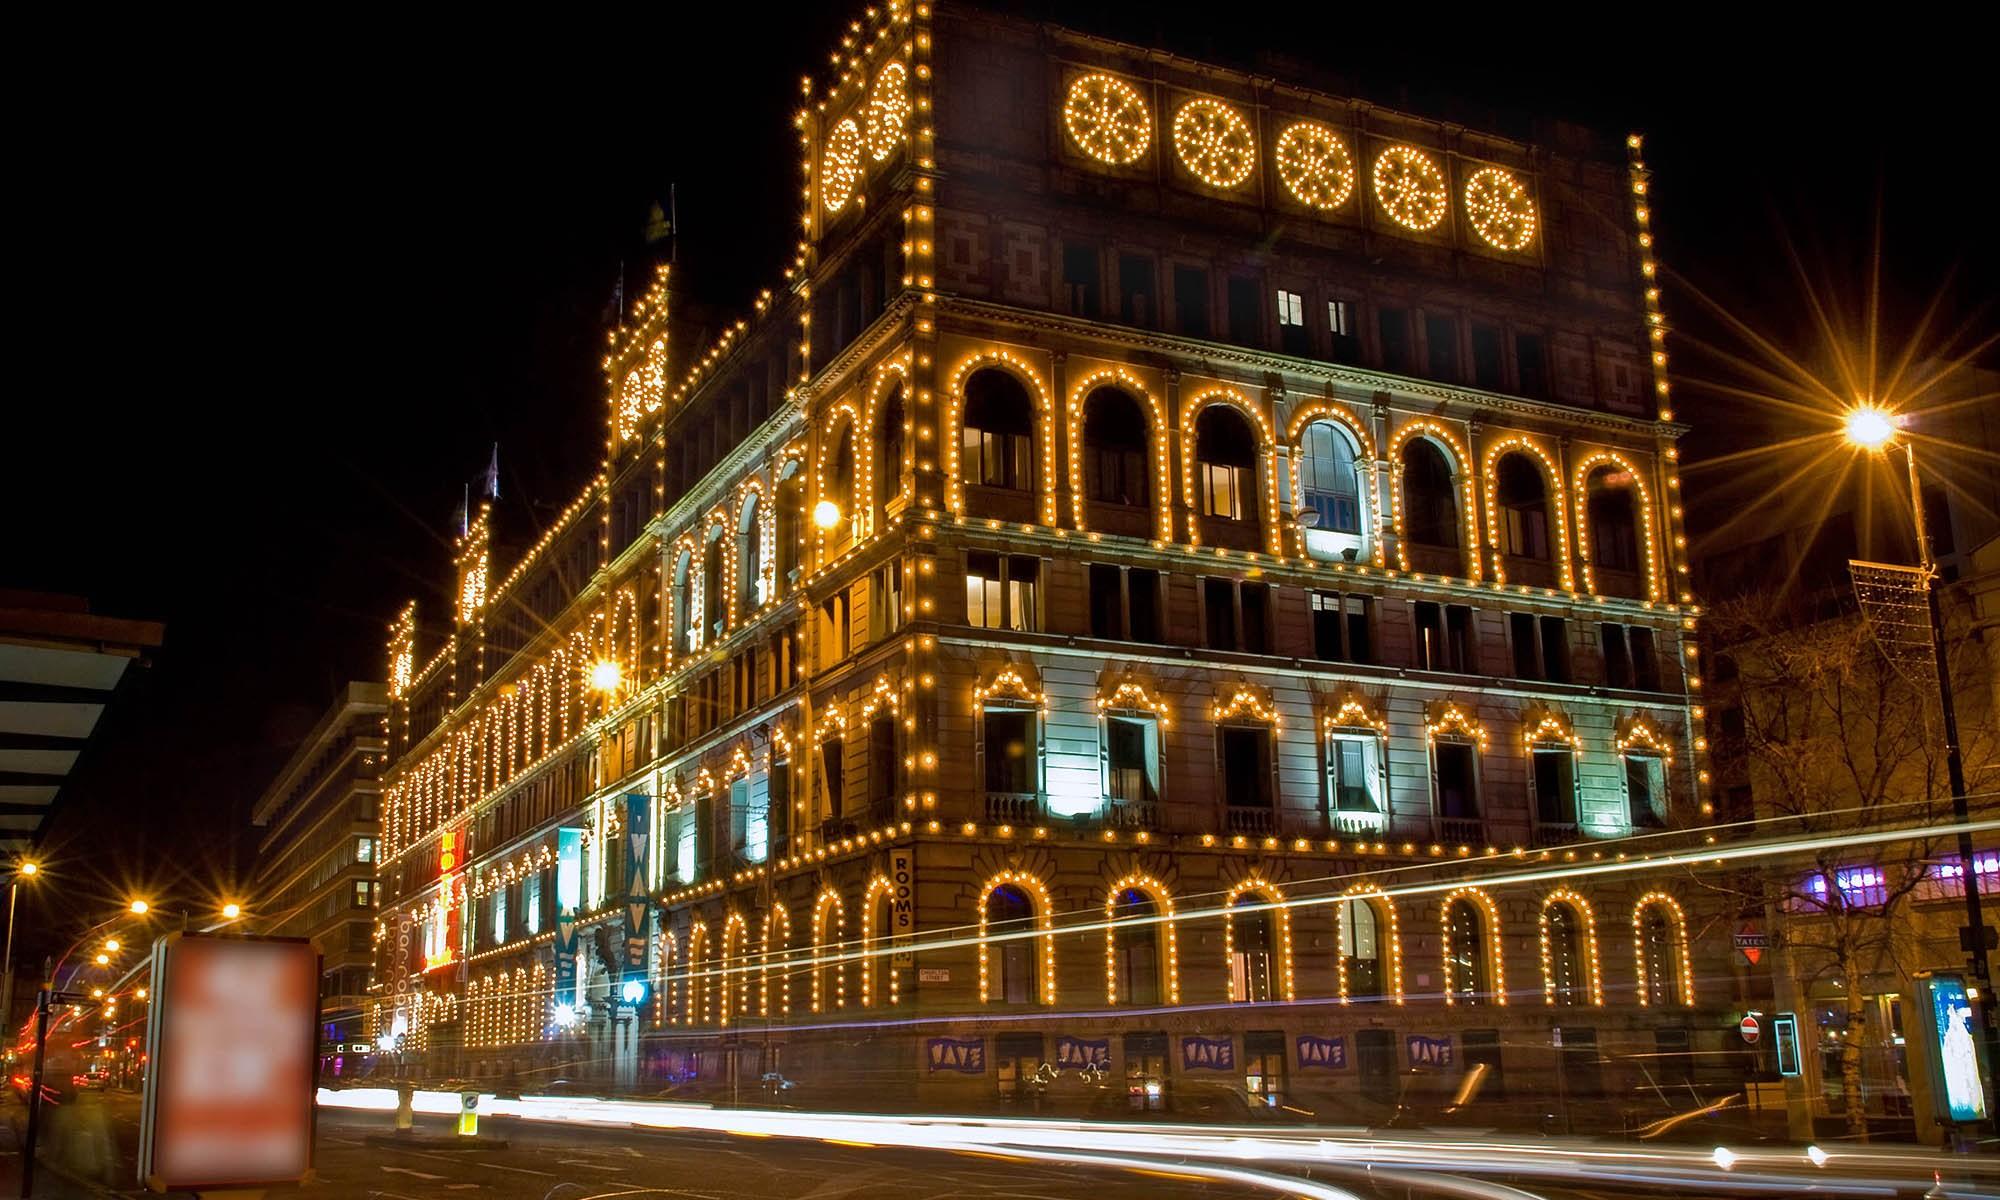 Britannia Hotel, Manchester at Night